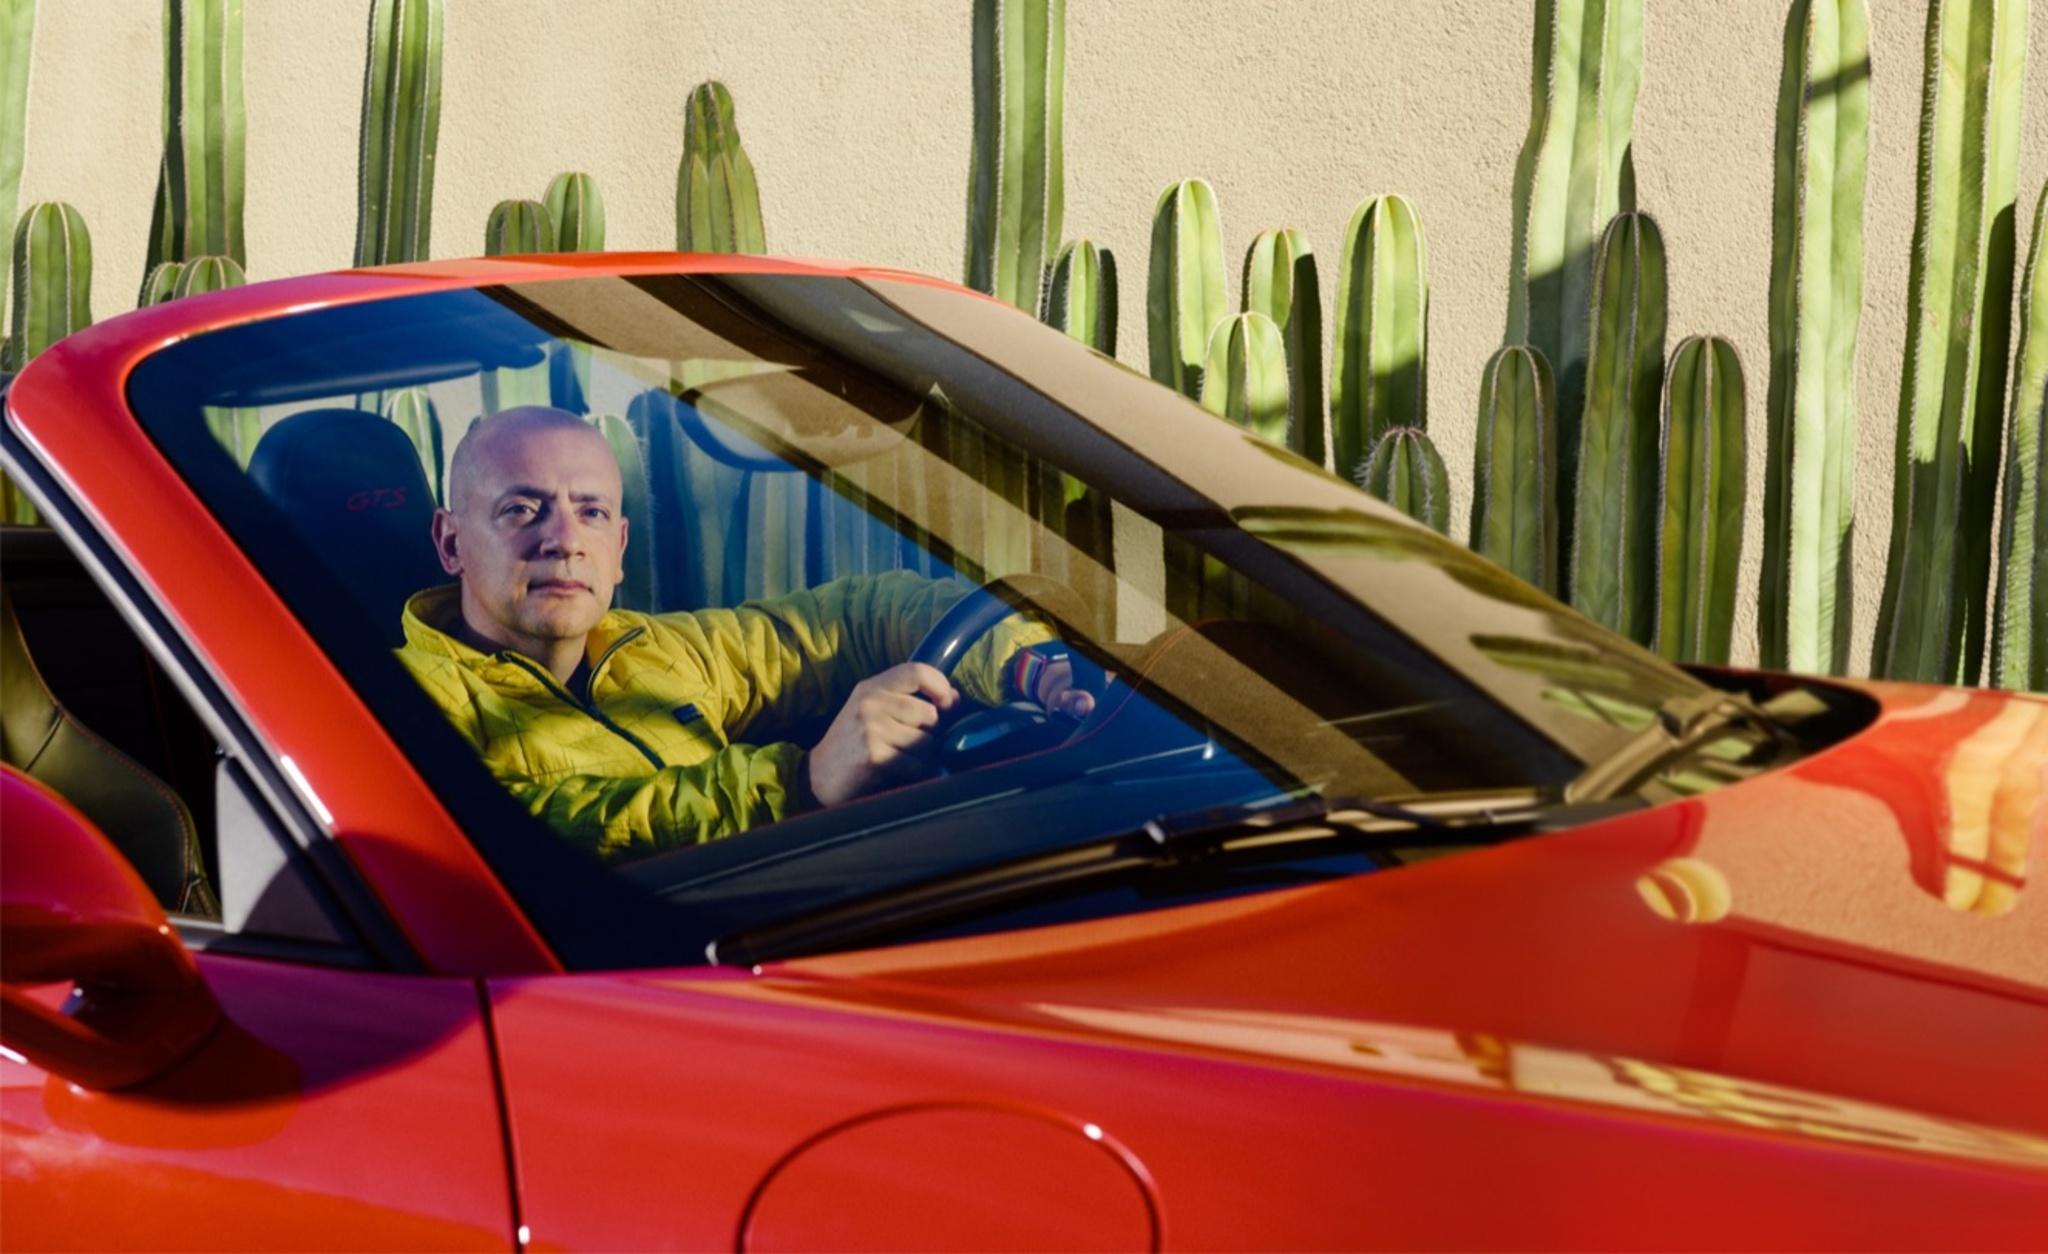 Once a refugee, Haddad now runs the high-end car-rental app Turo.